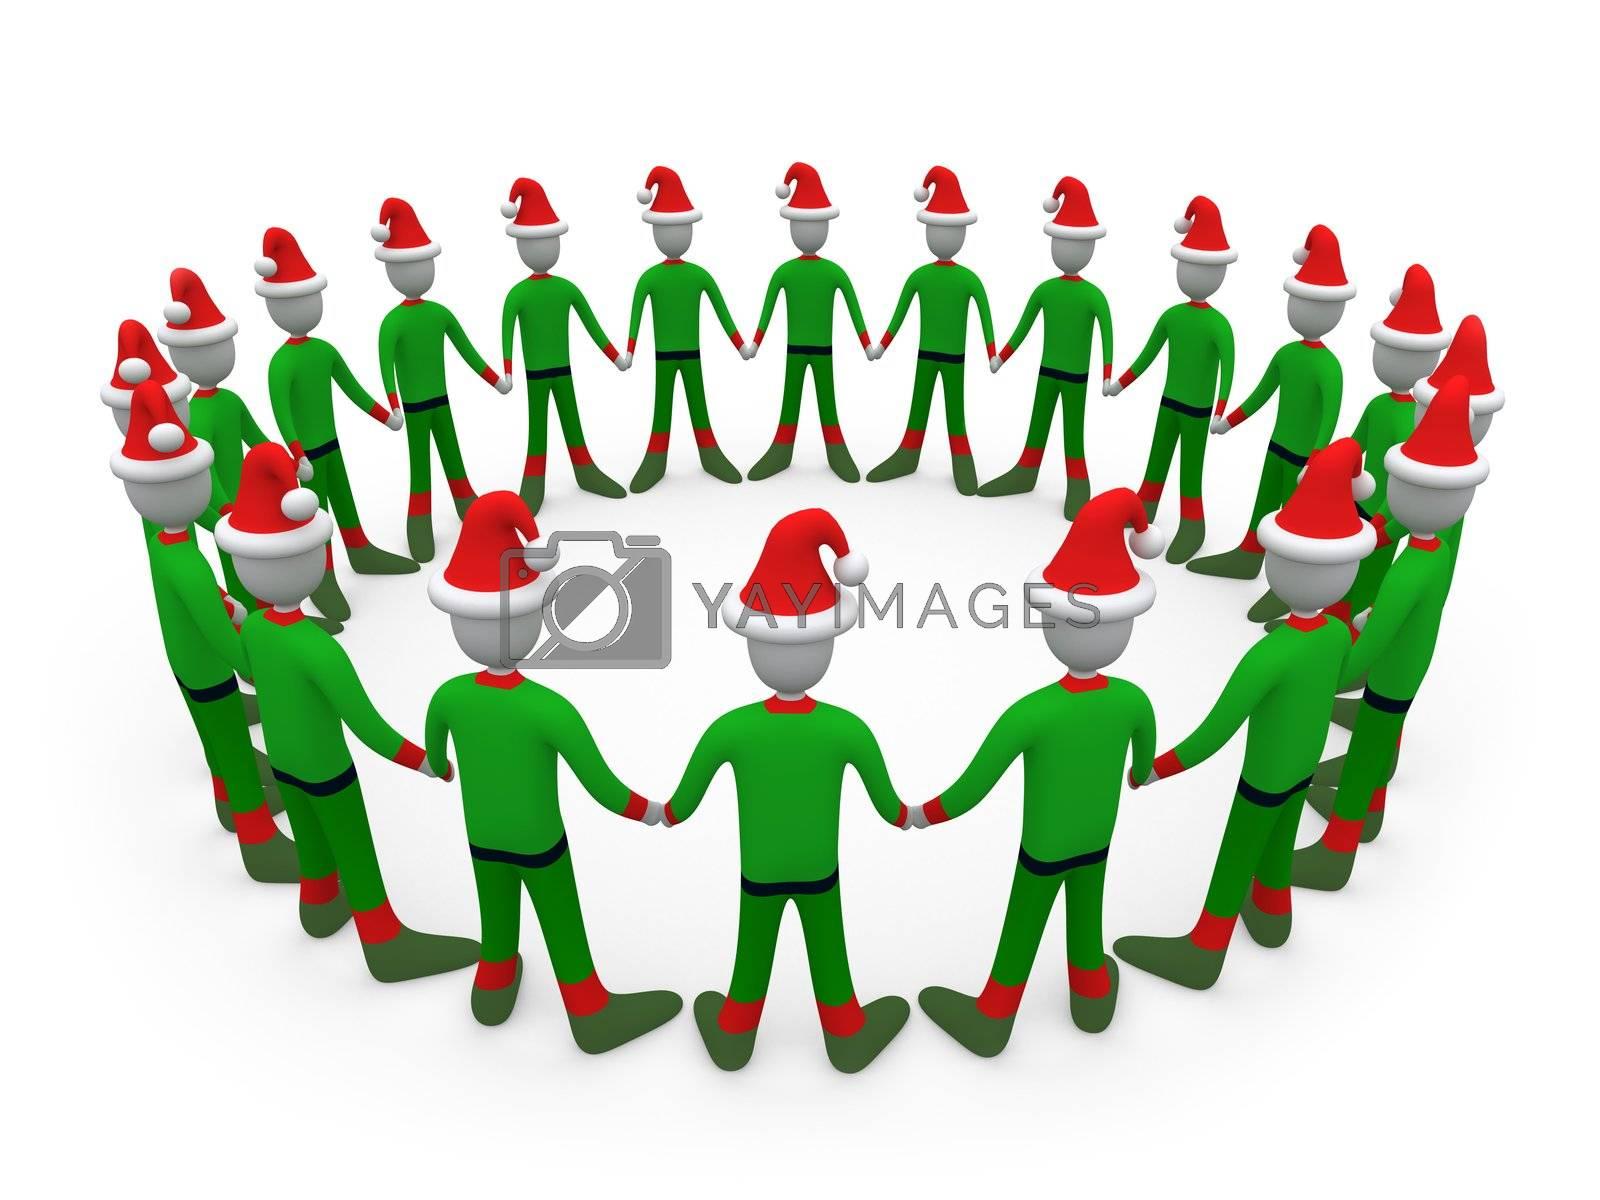 Computer generated image - Santa's Helpers in Circle.